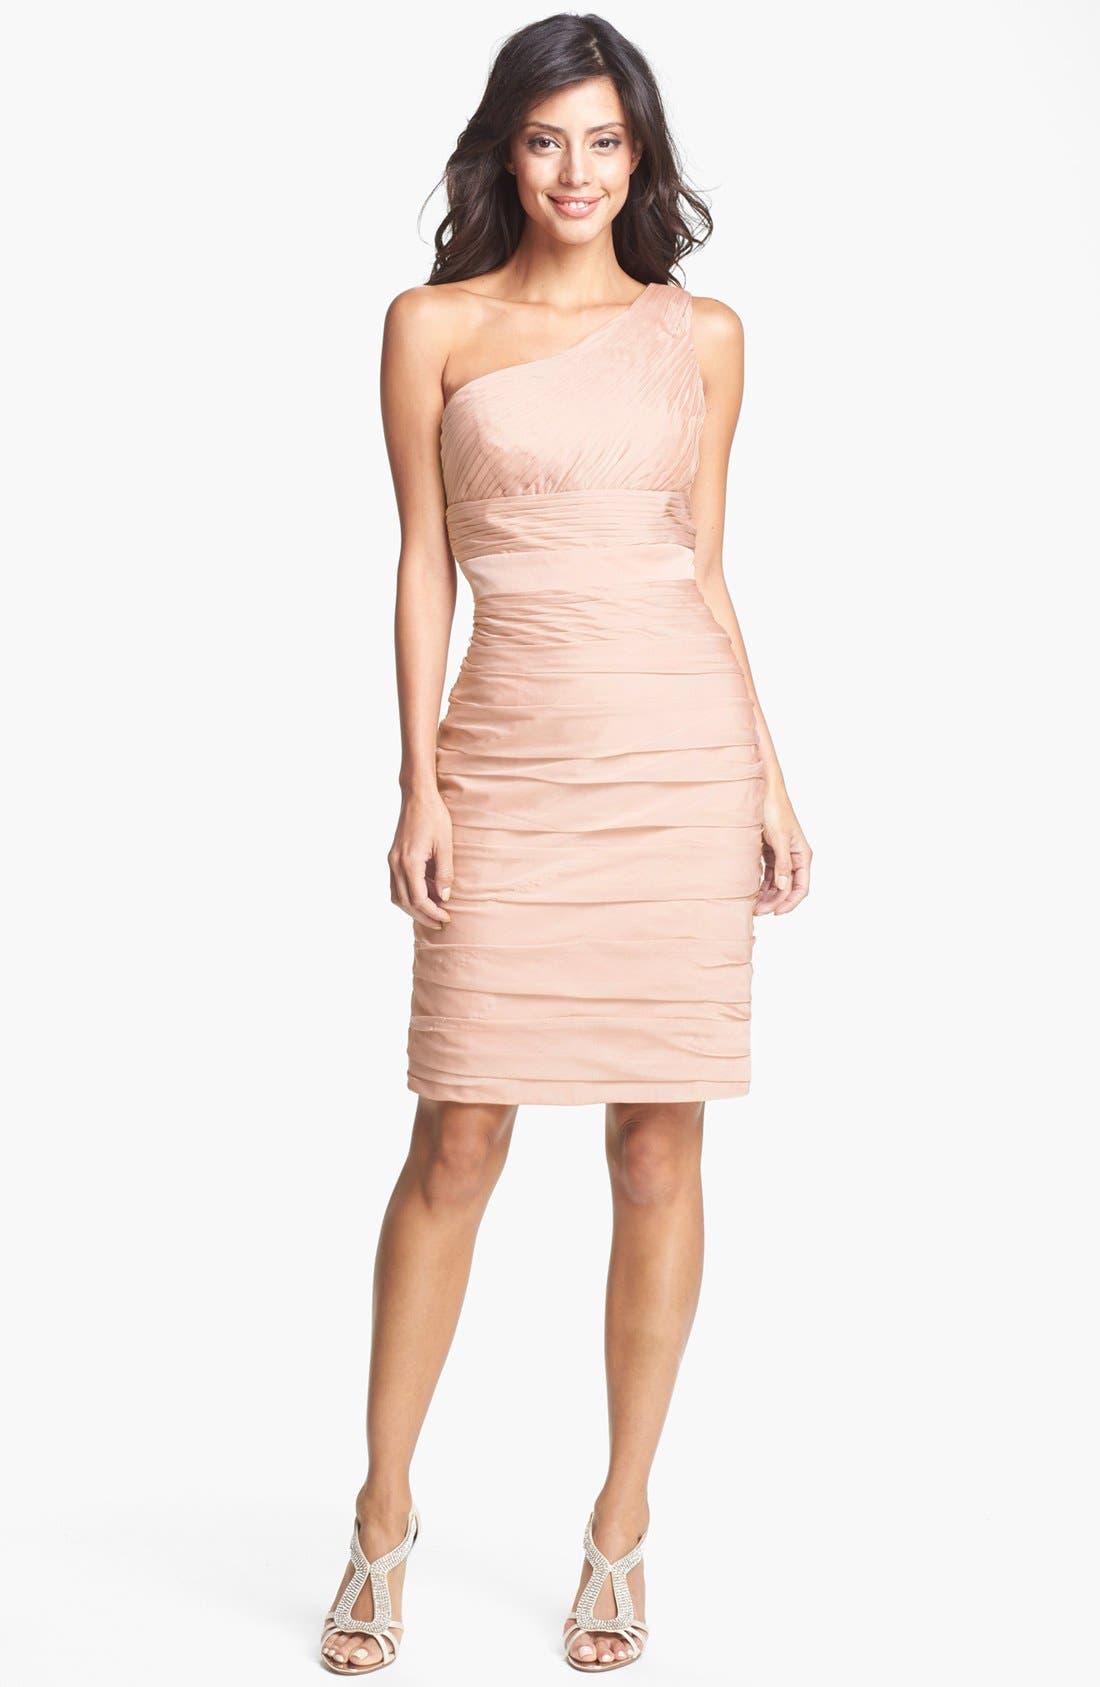 Main Image - ML Monique Lhuillier Bridesmaids Ruched One-Shoulder Sheath Dress (Nordstrom Exclusive)